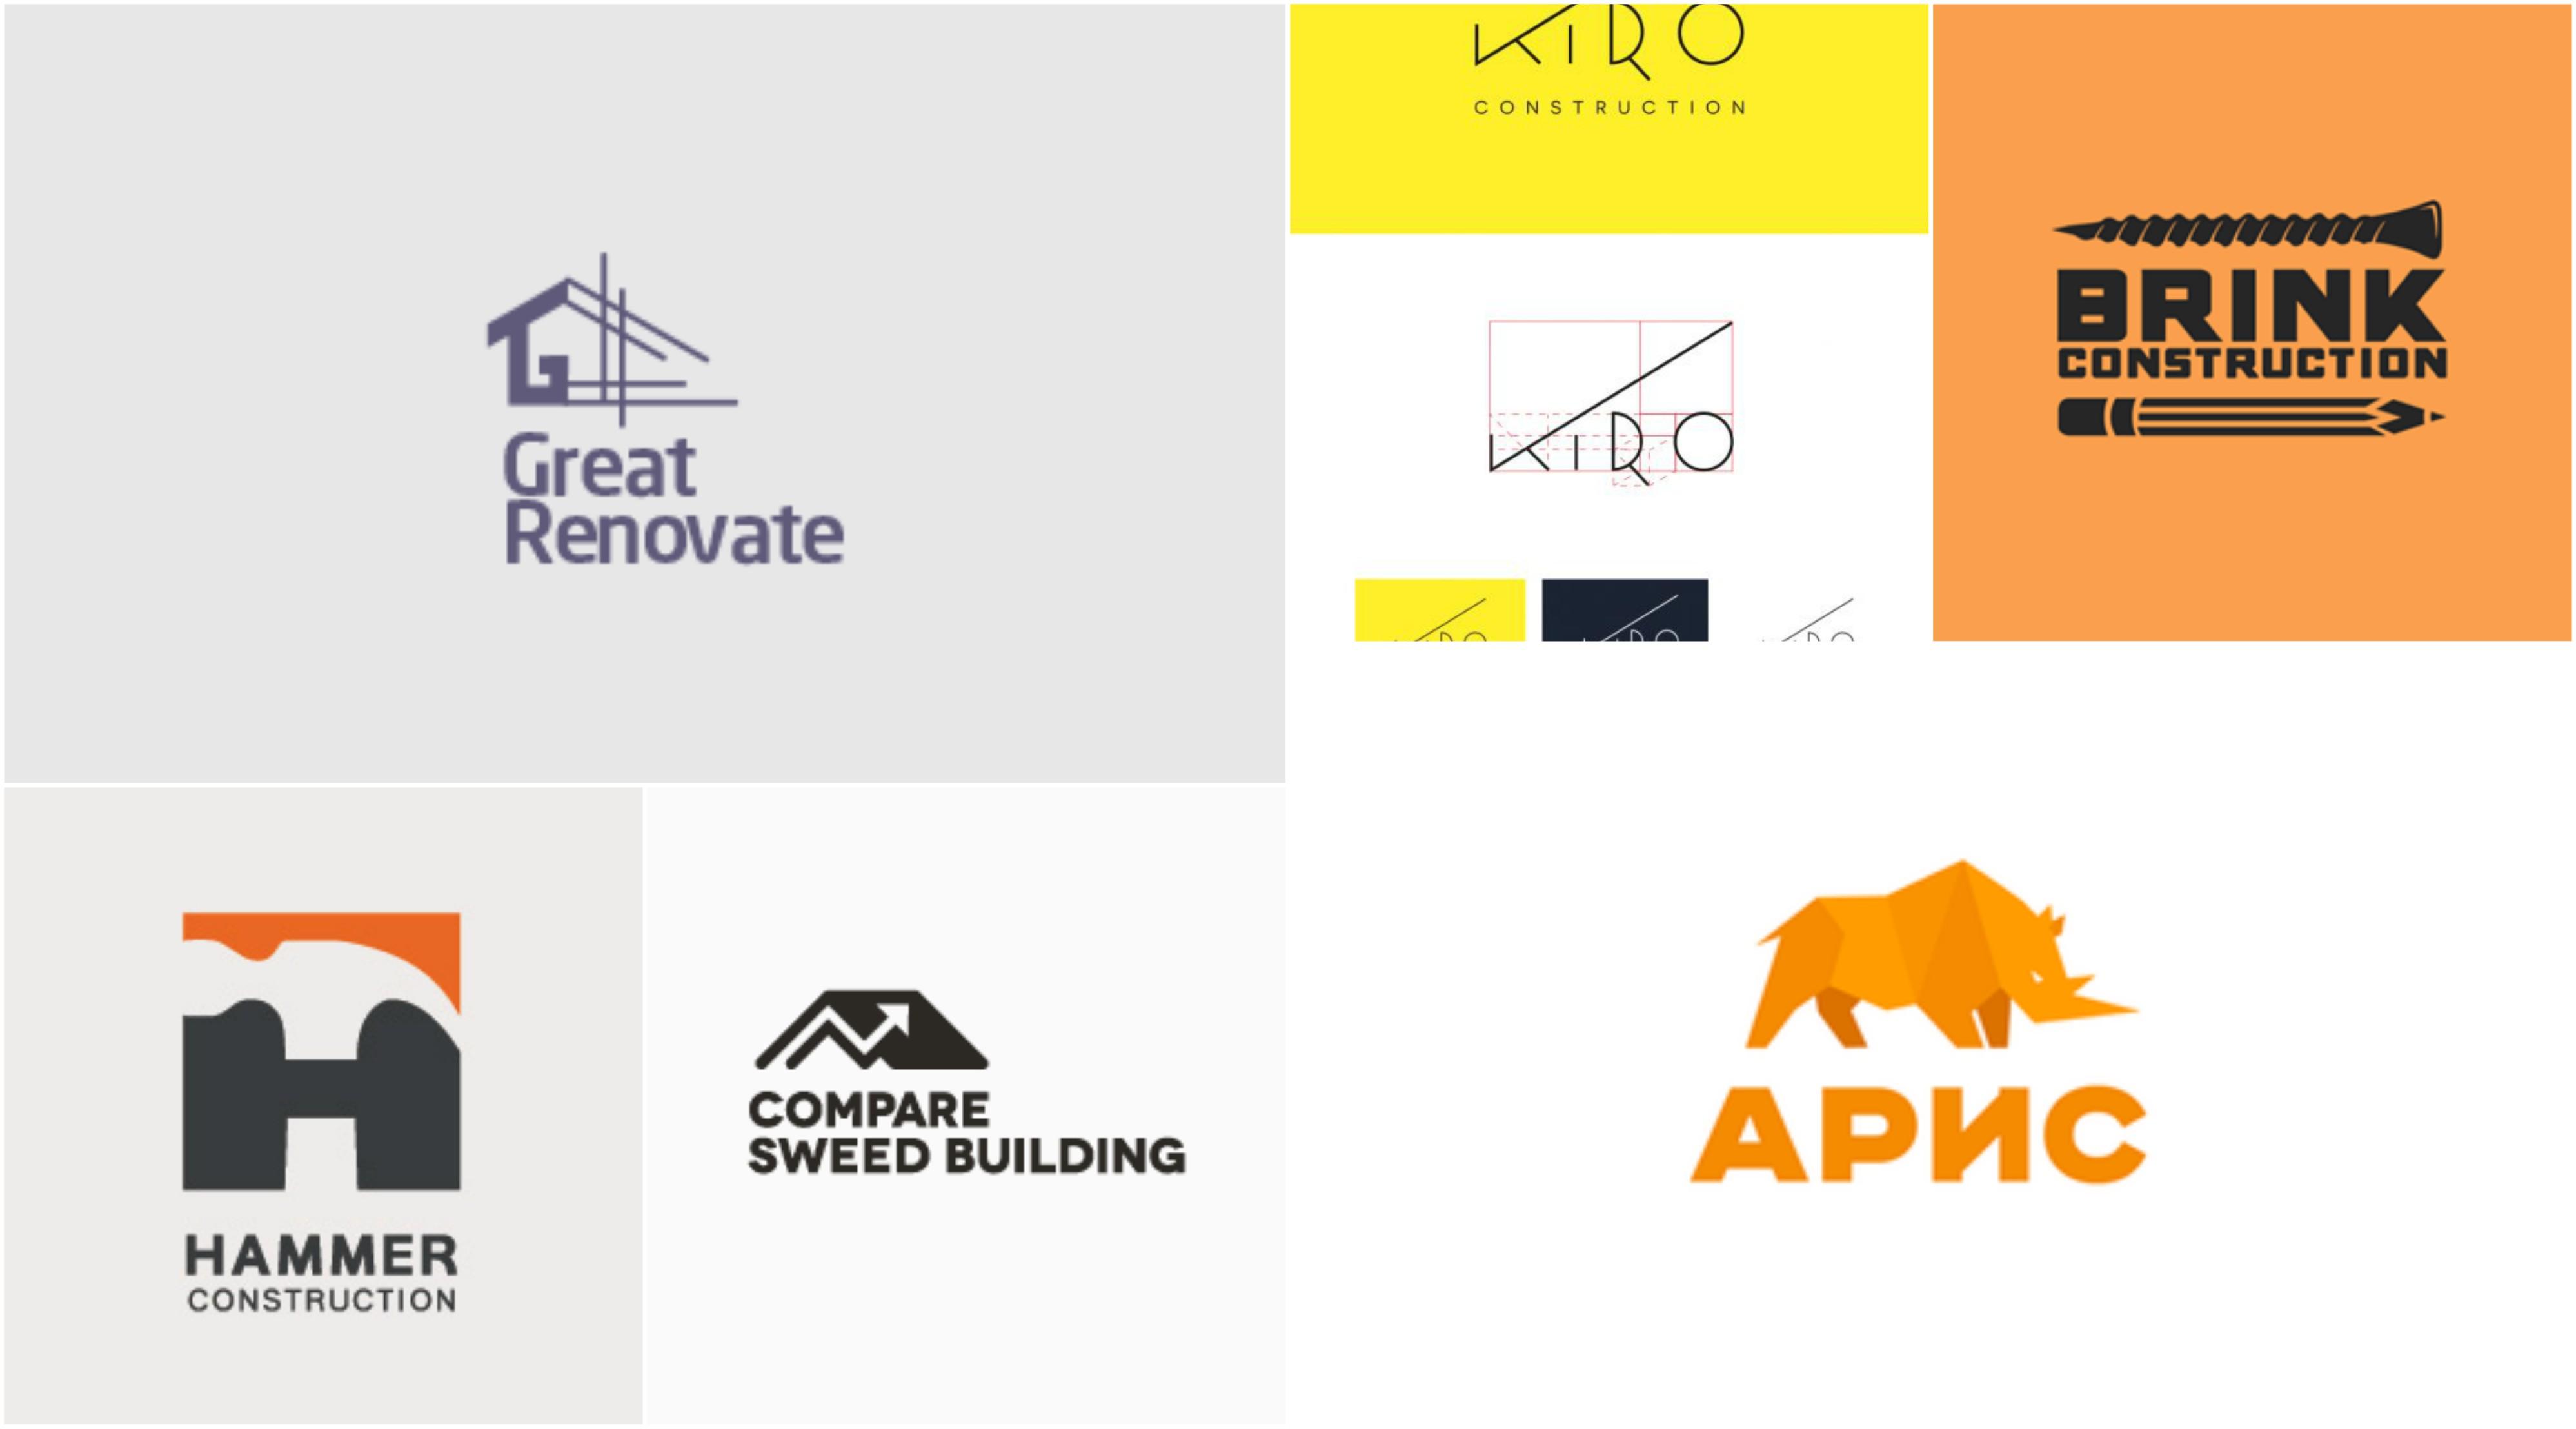 45 Original Construction Logo Ideas Inspirationfeed,Good Business Card Design